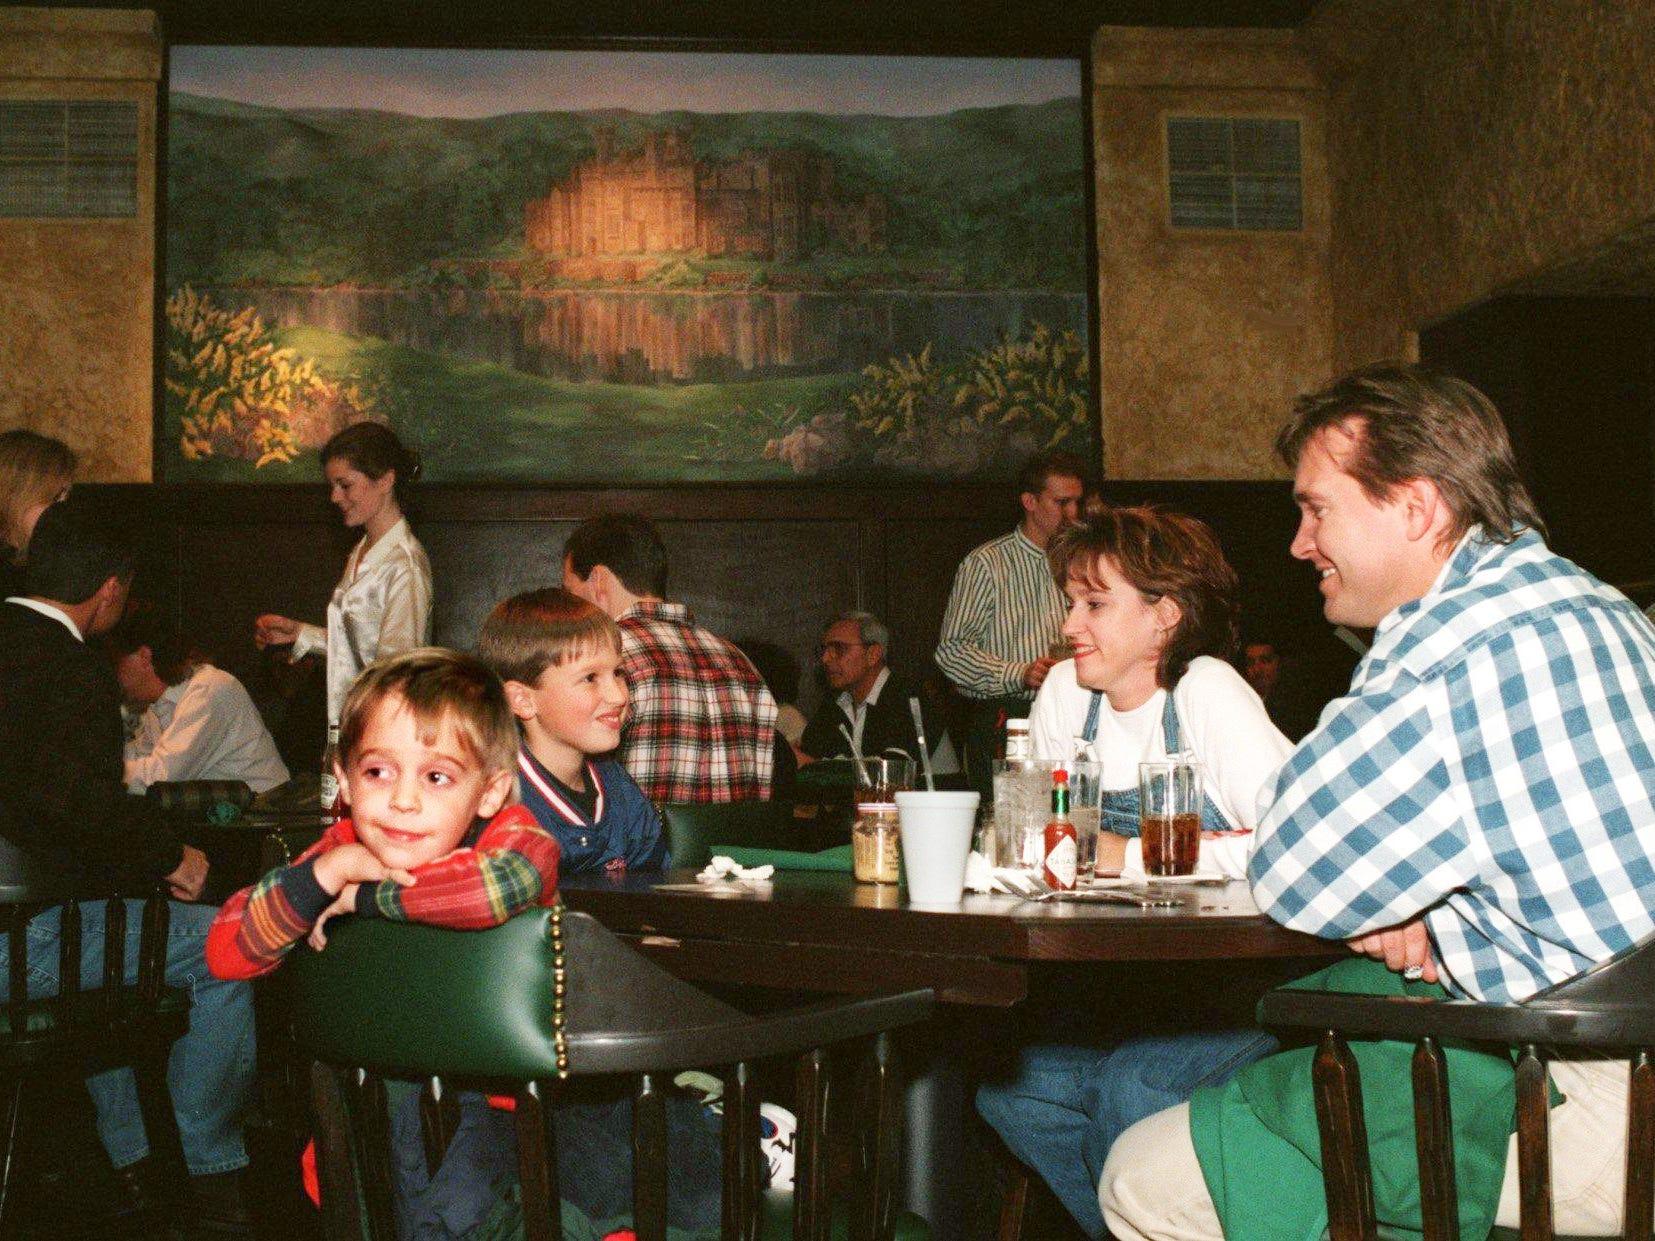 Austin Casassa, left, Ryan Casassa, Julie Casassa and Curt Casassa wait for their food at Ireland's Nov. 23, 1997.